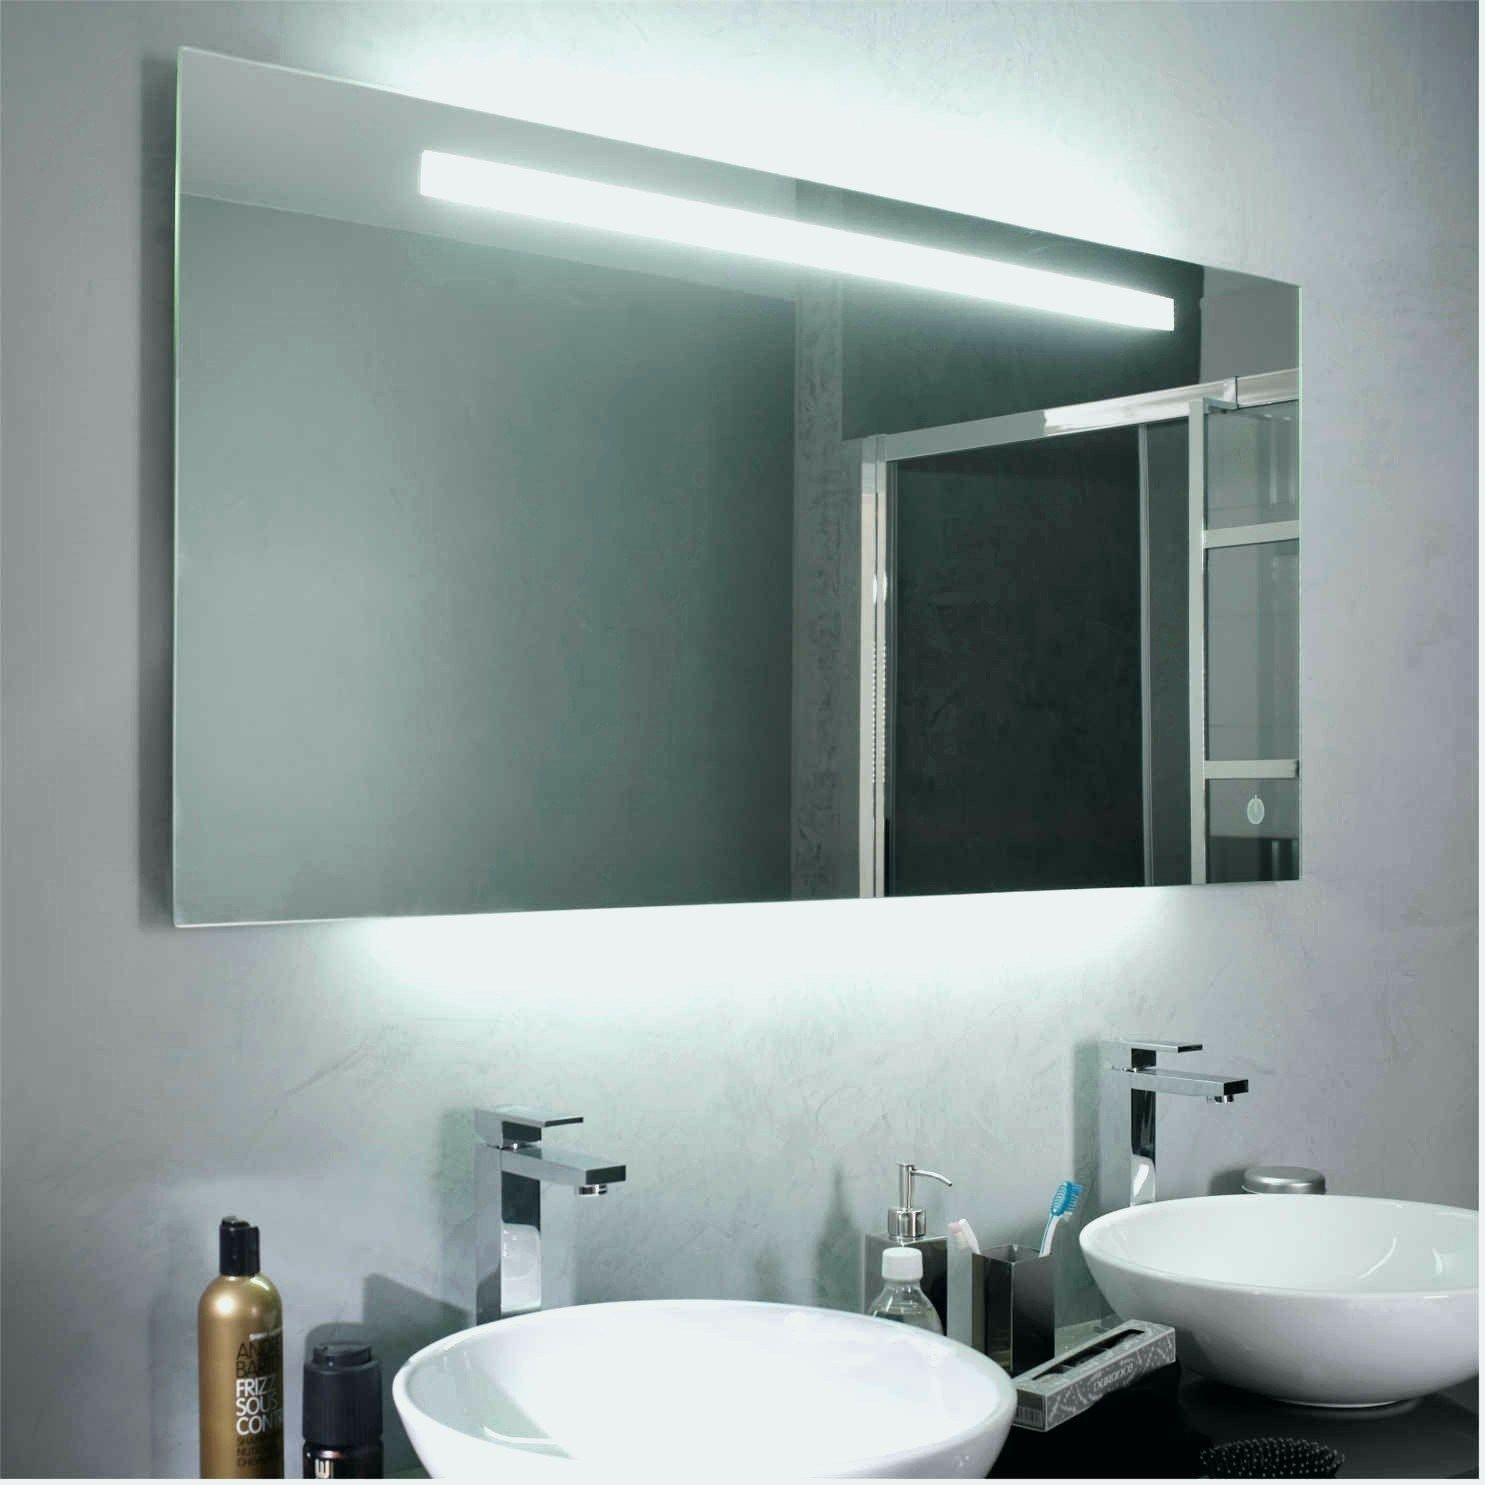 New Colle Faience Brico Depot Modern Bathroom Vanity Bathroom Mirror Lighted Bathroom Mirror